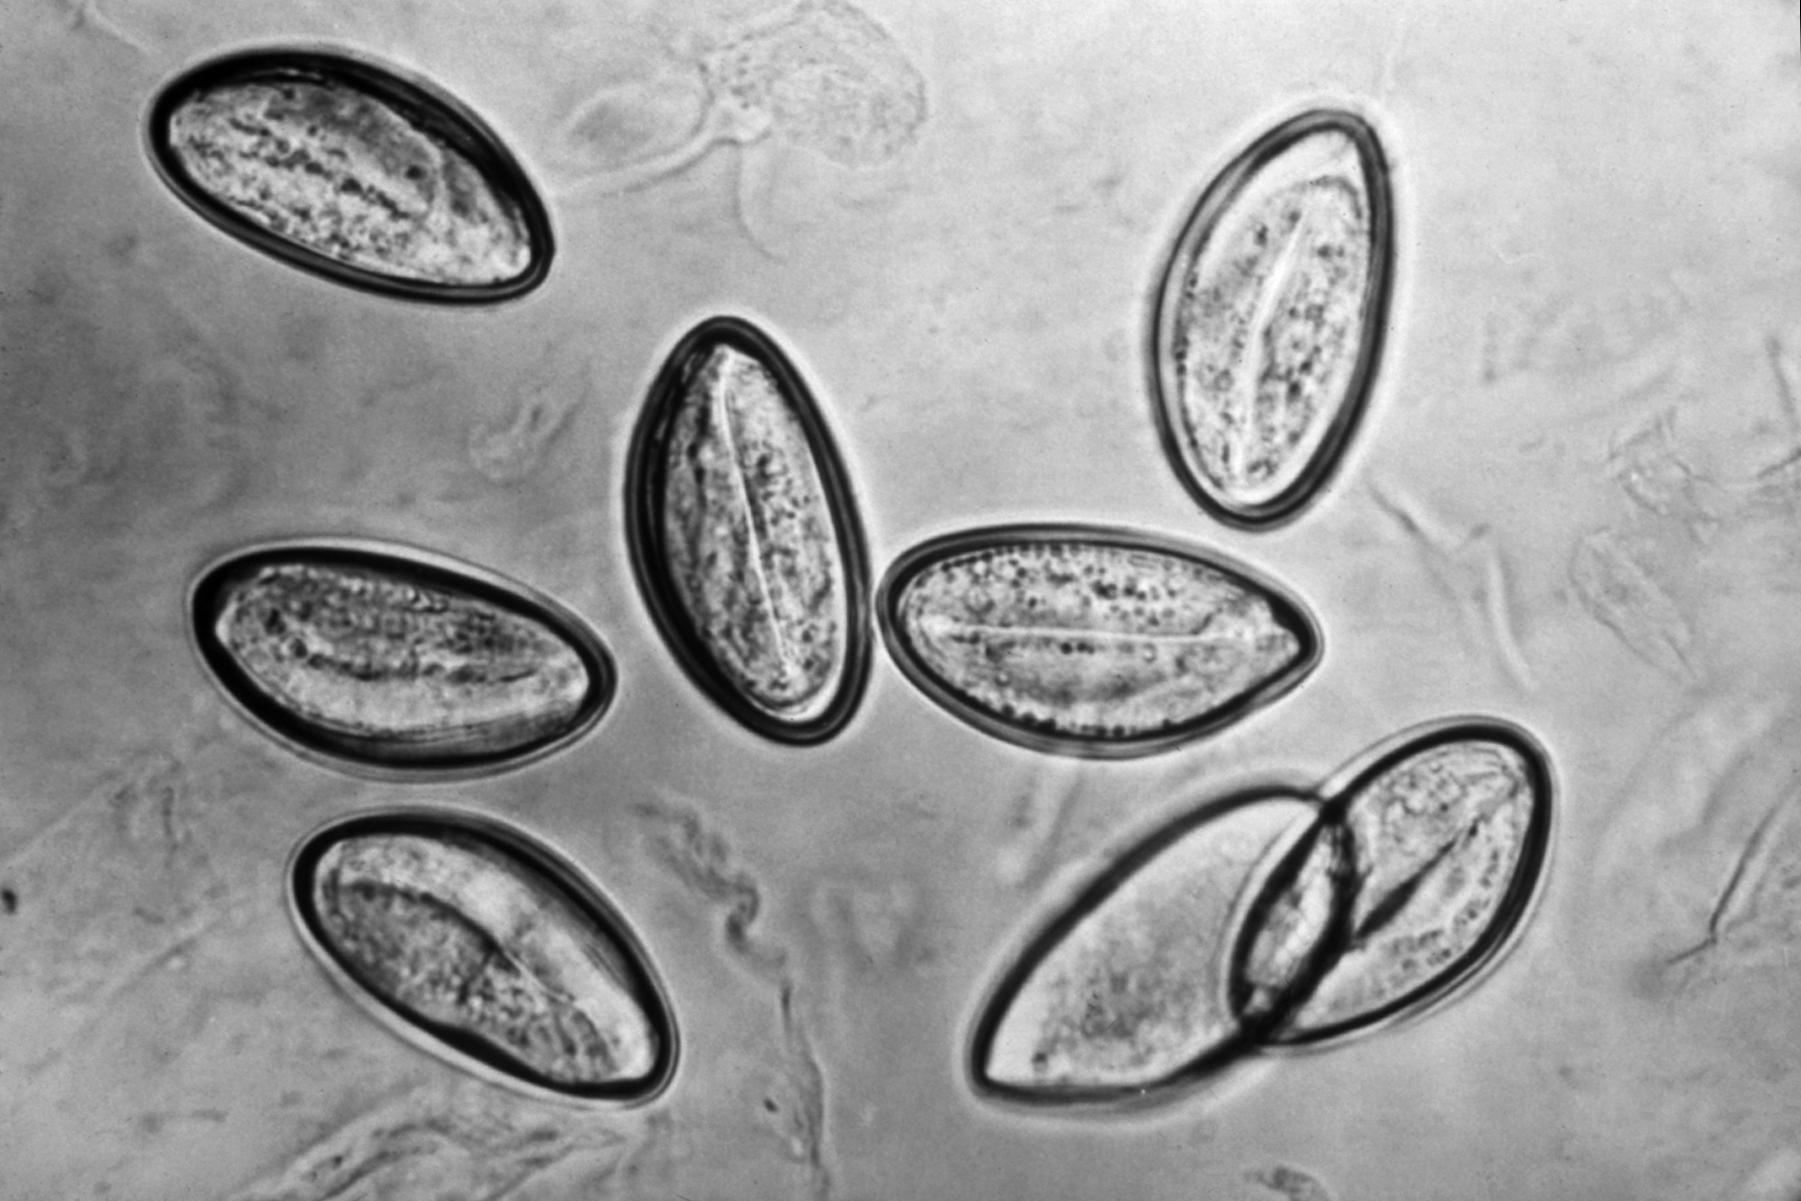 enterobius vermicularis terjedési forma